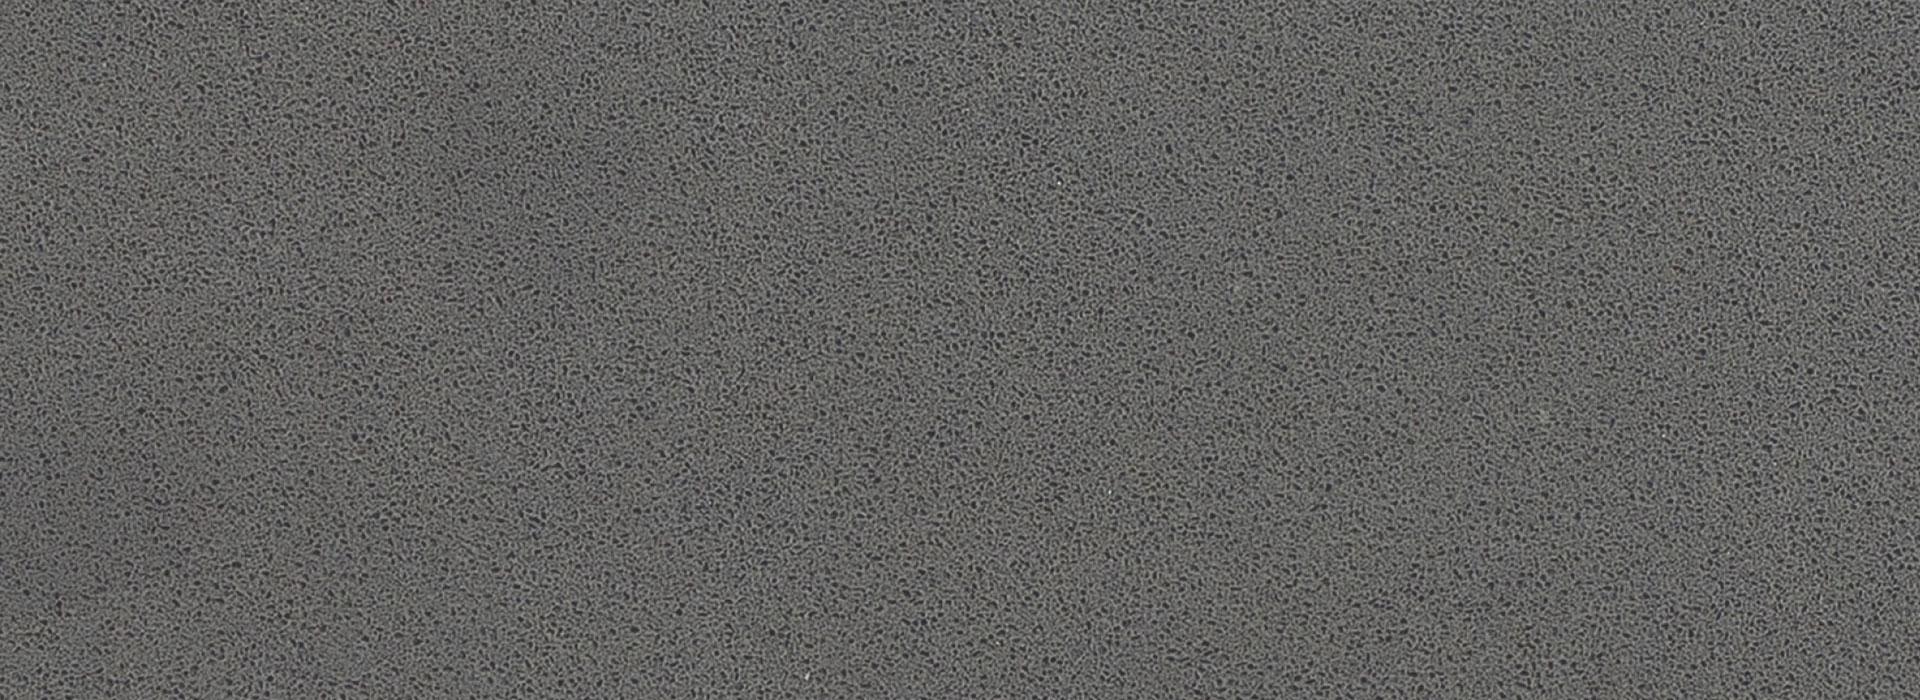 Calisco-Elatris-4004